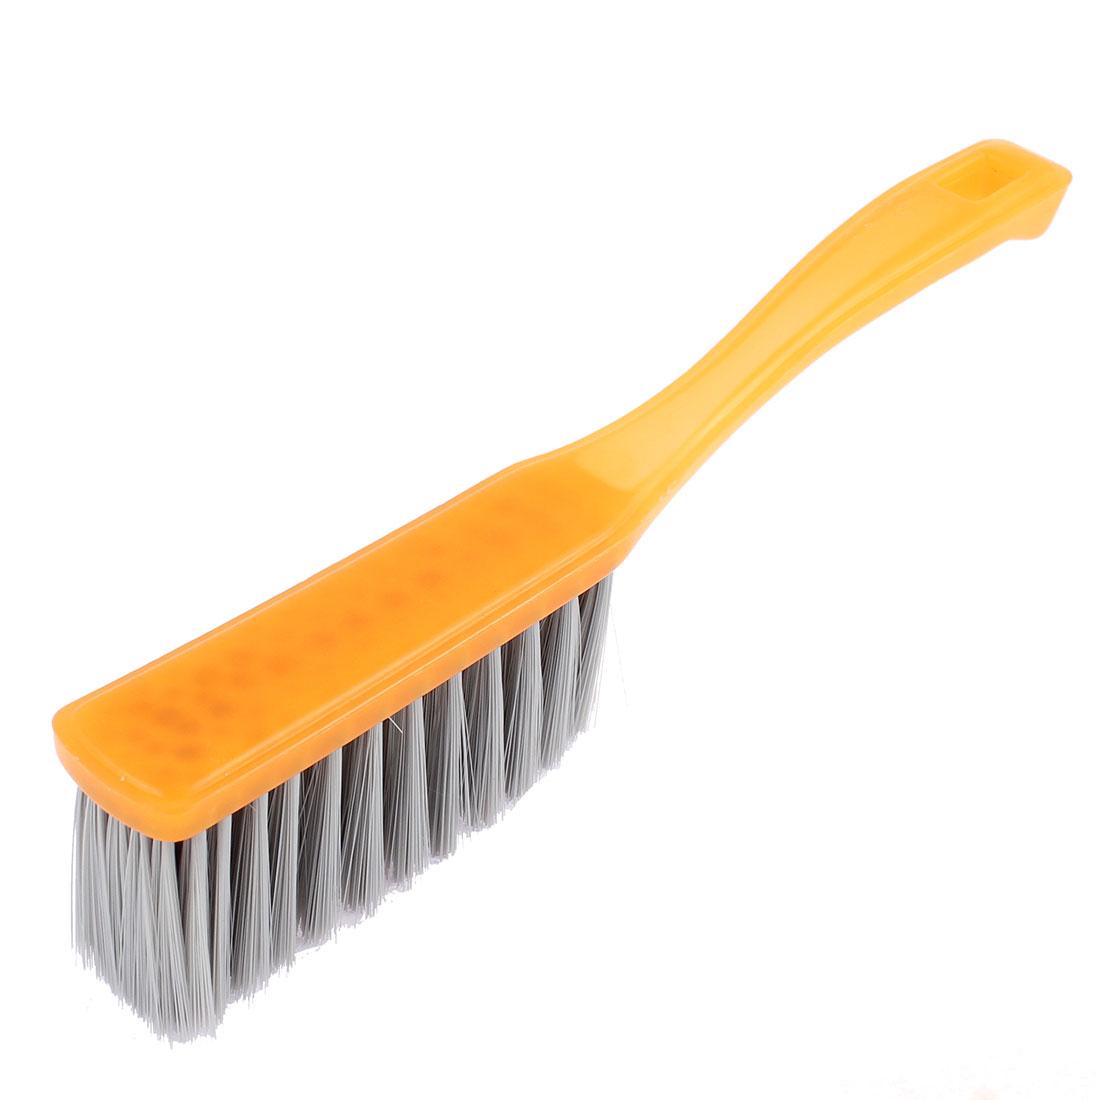 "Plastic Long Handle Hang Hole Scrubbing Brush Yellow 11"" Length"